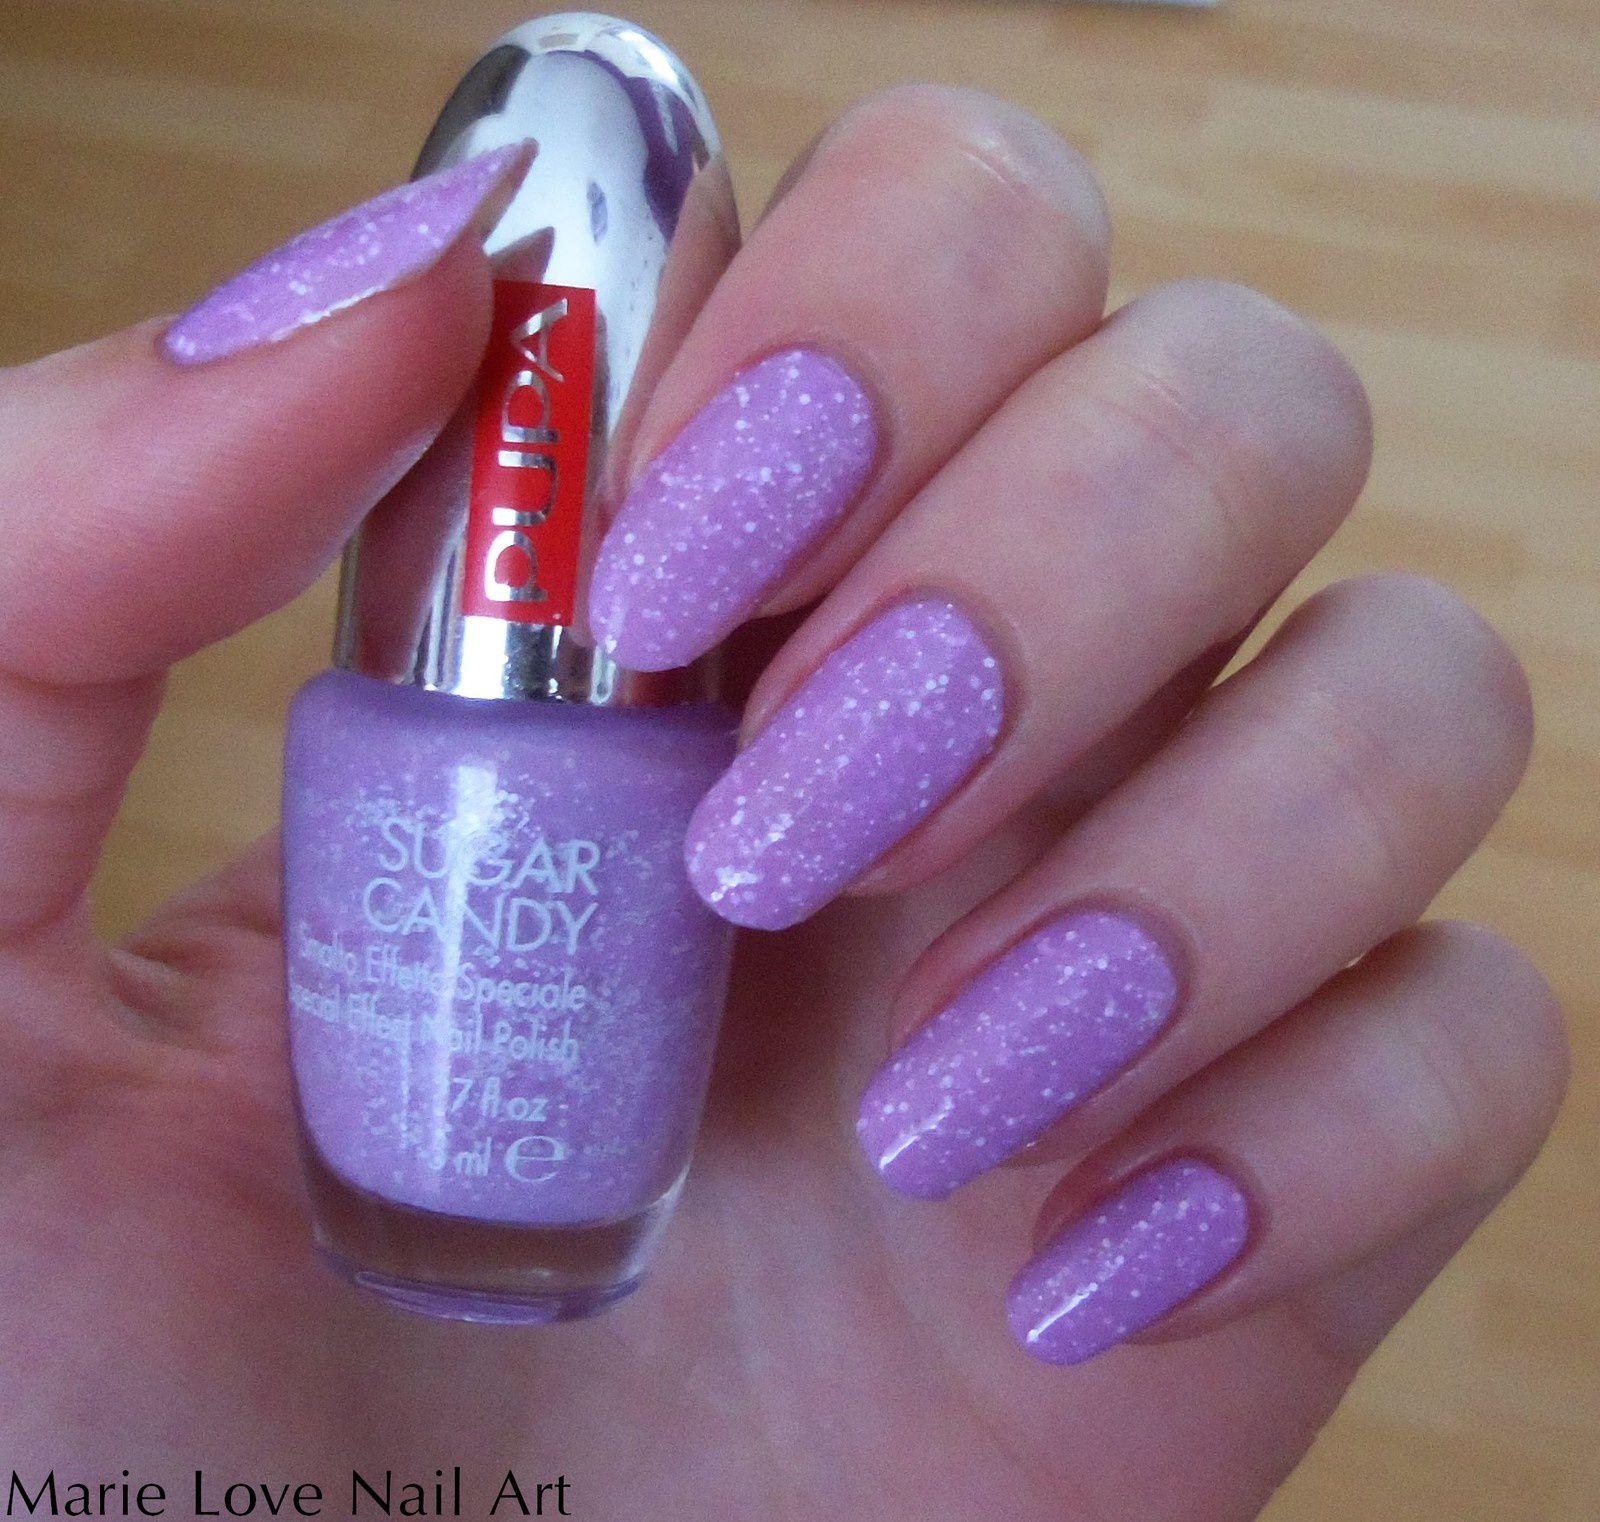 Pupa - Sugar Candy Lilac 001